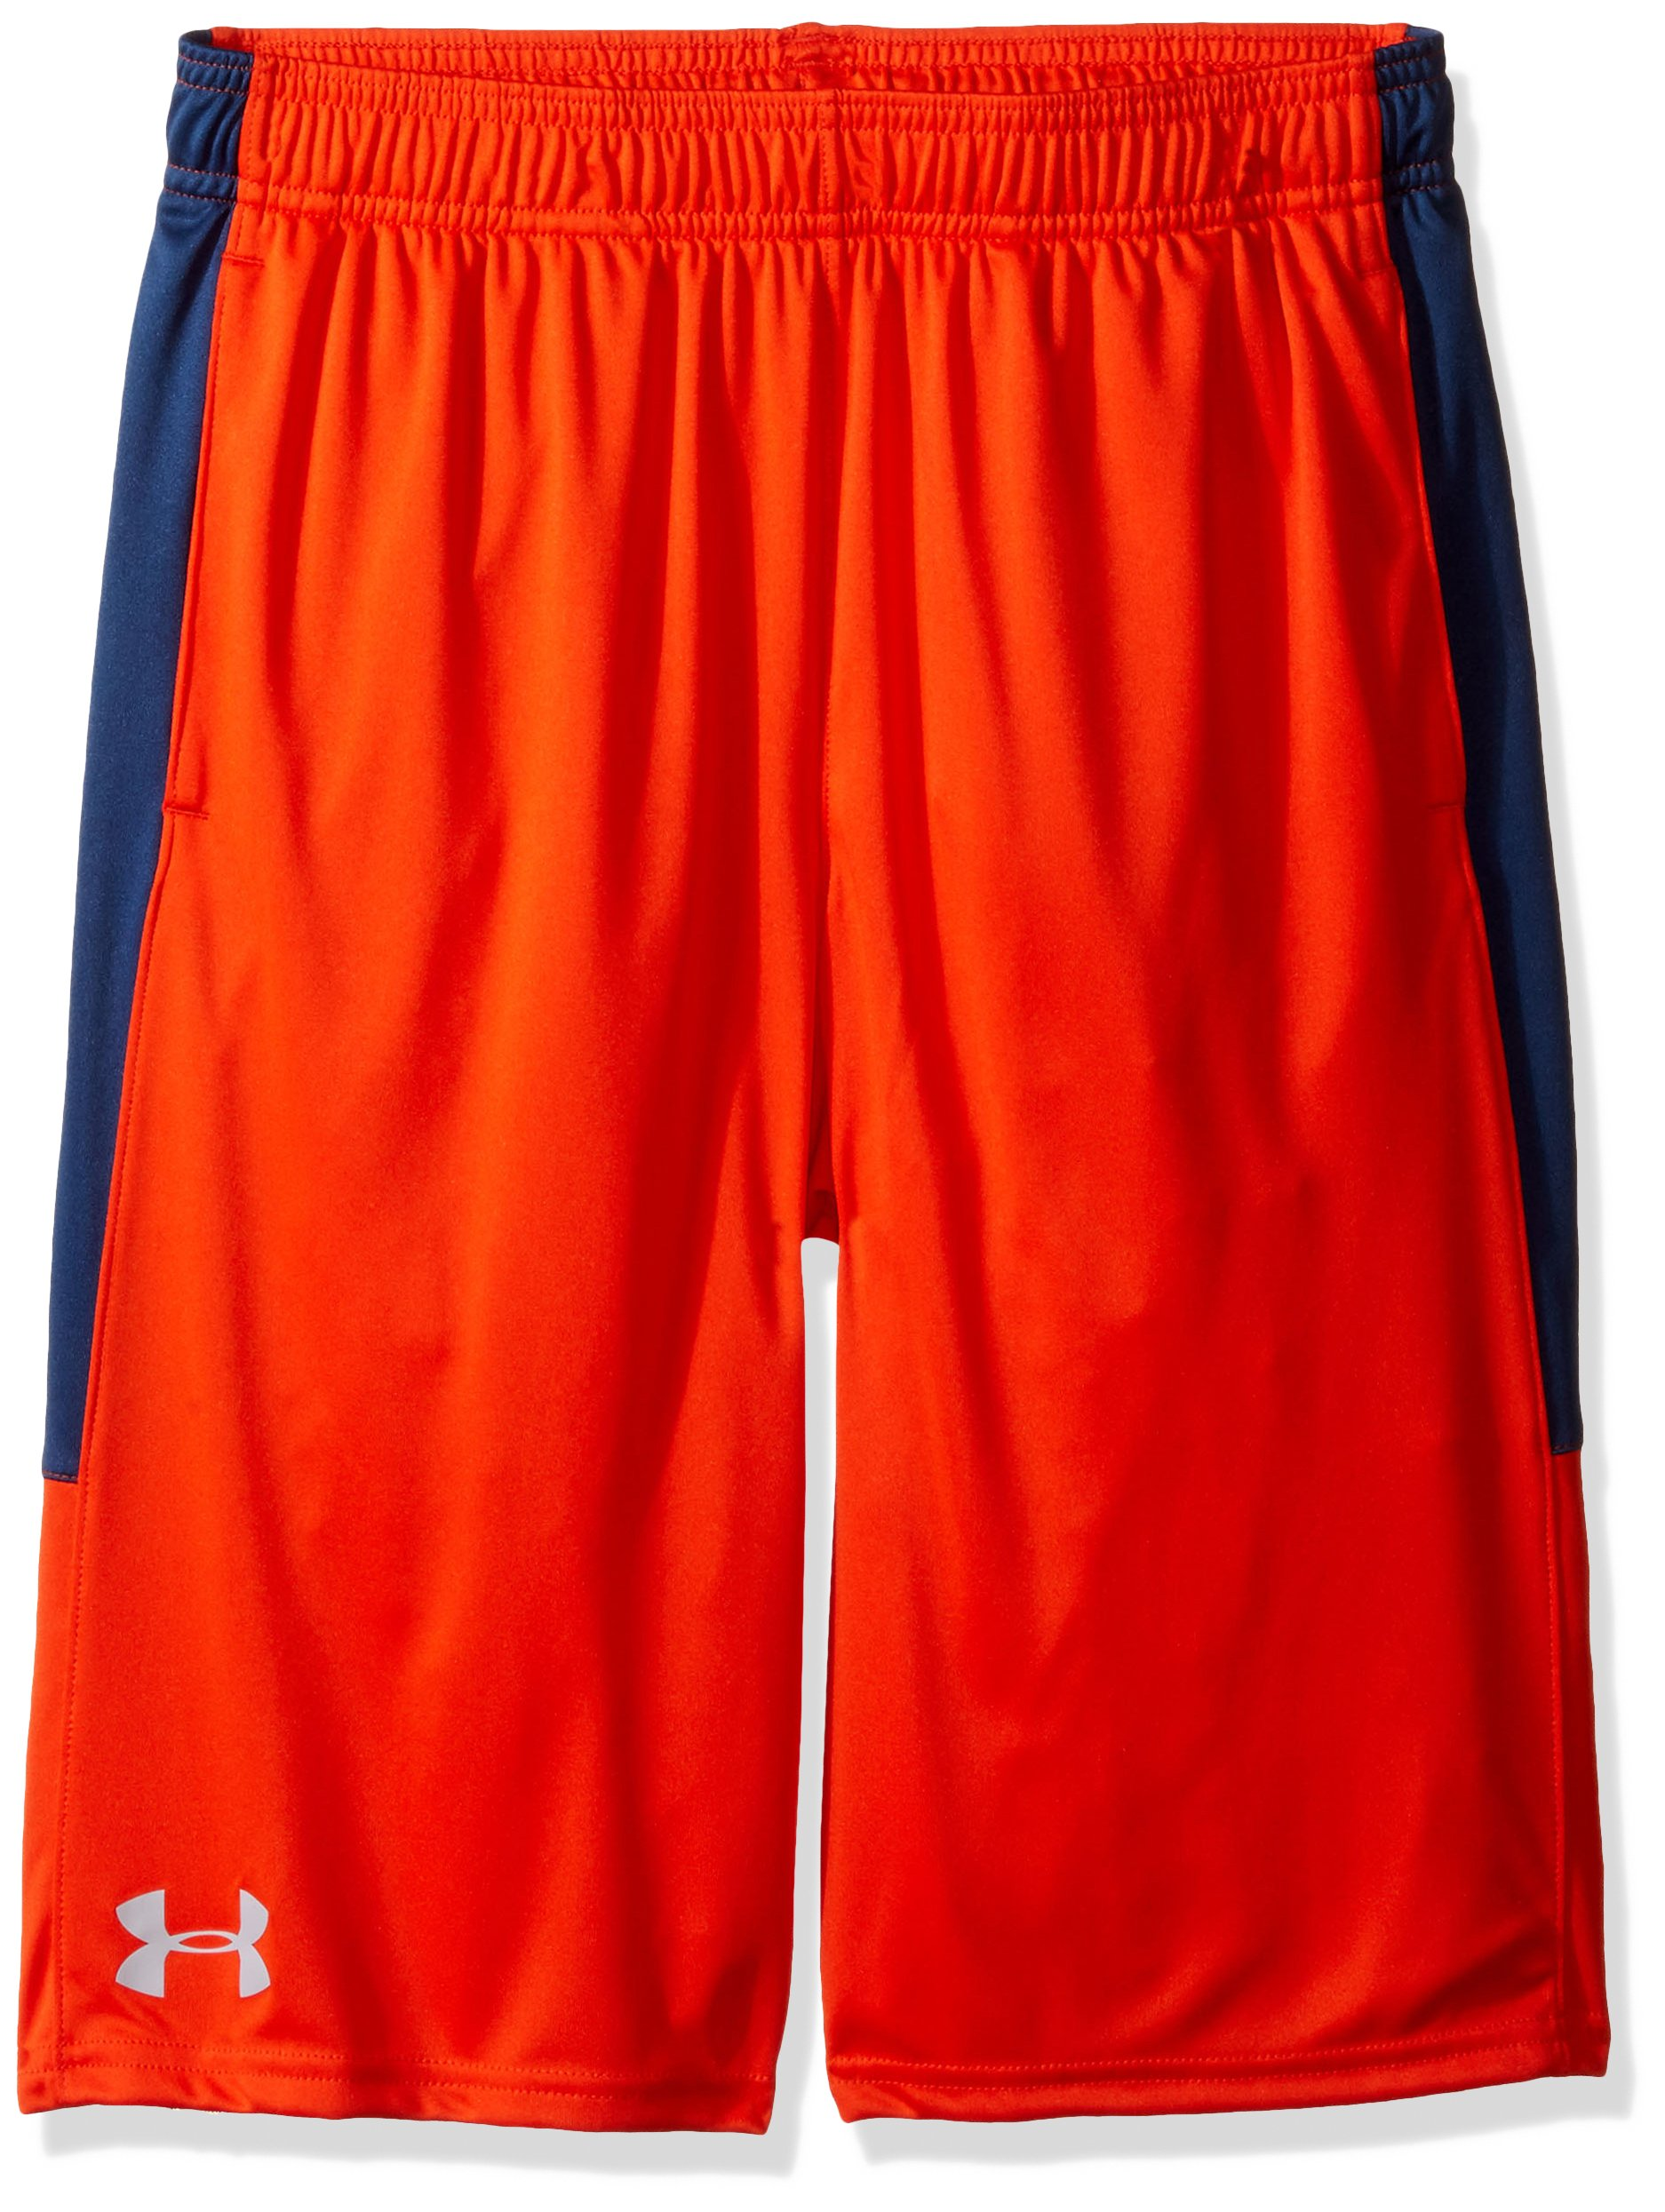 Under Armour Boys Instinct Shorts,Dark Orange /Overcast Gray Youth Small by Under Armour